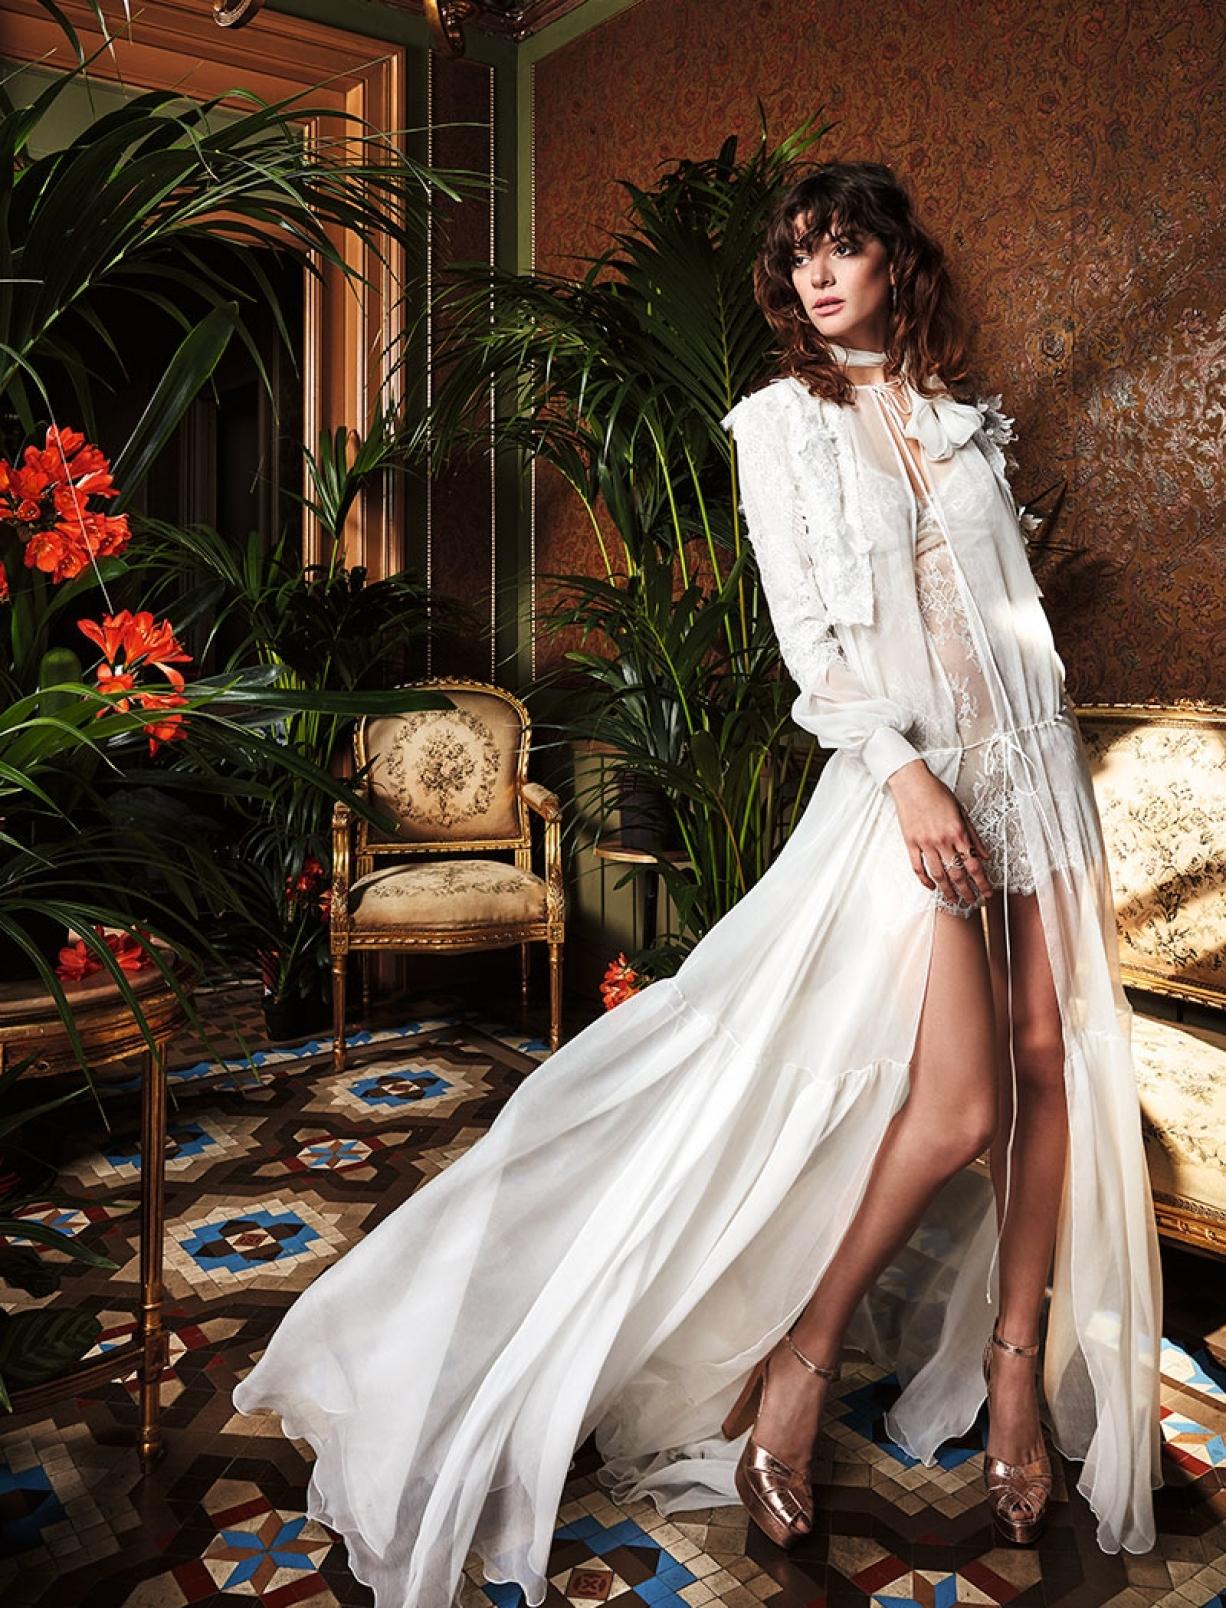 boho_chic_wedding_dresses_2017_bohemian_lace_wedding_dress_yolan_cris_chris_style_camomila-2.jpg